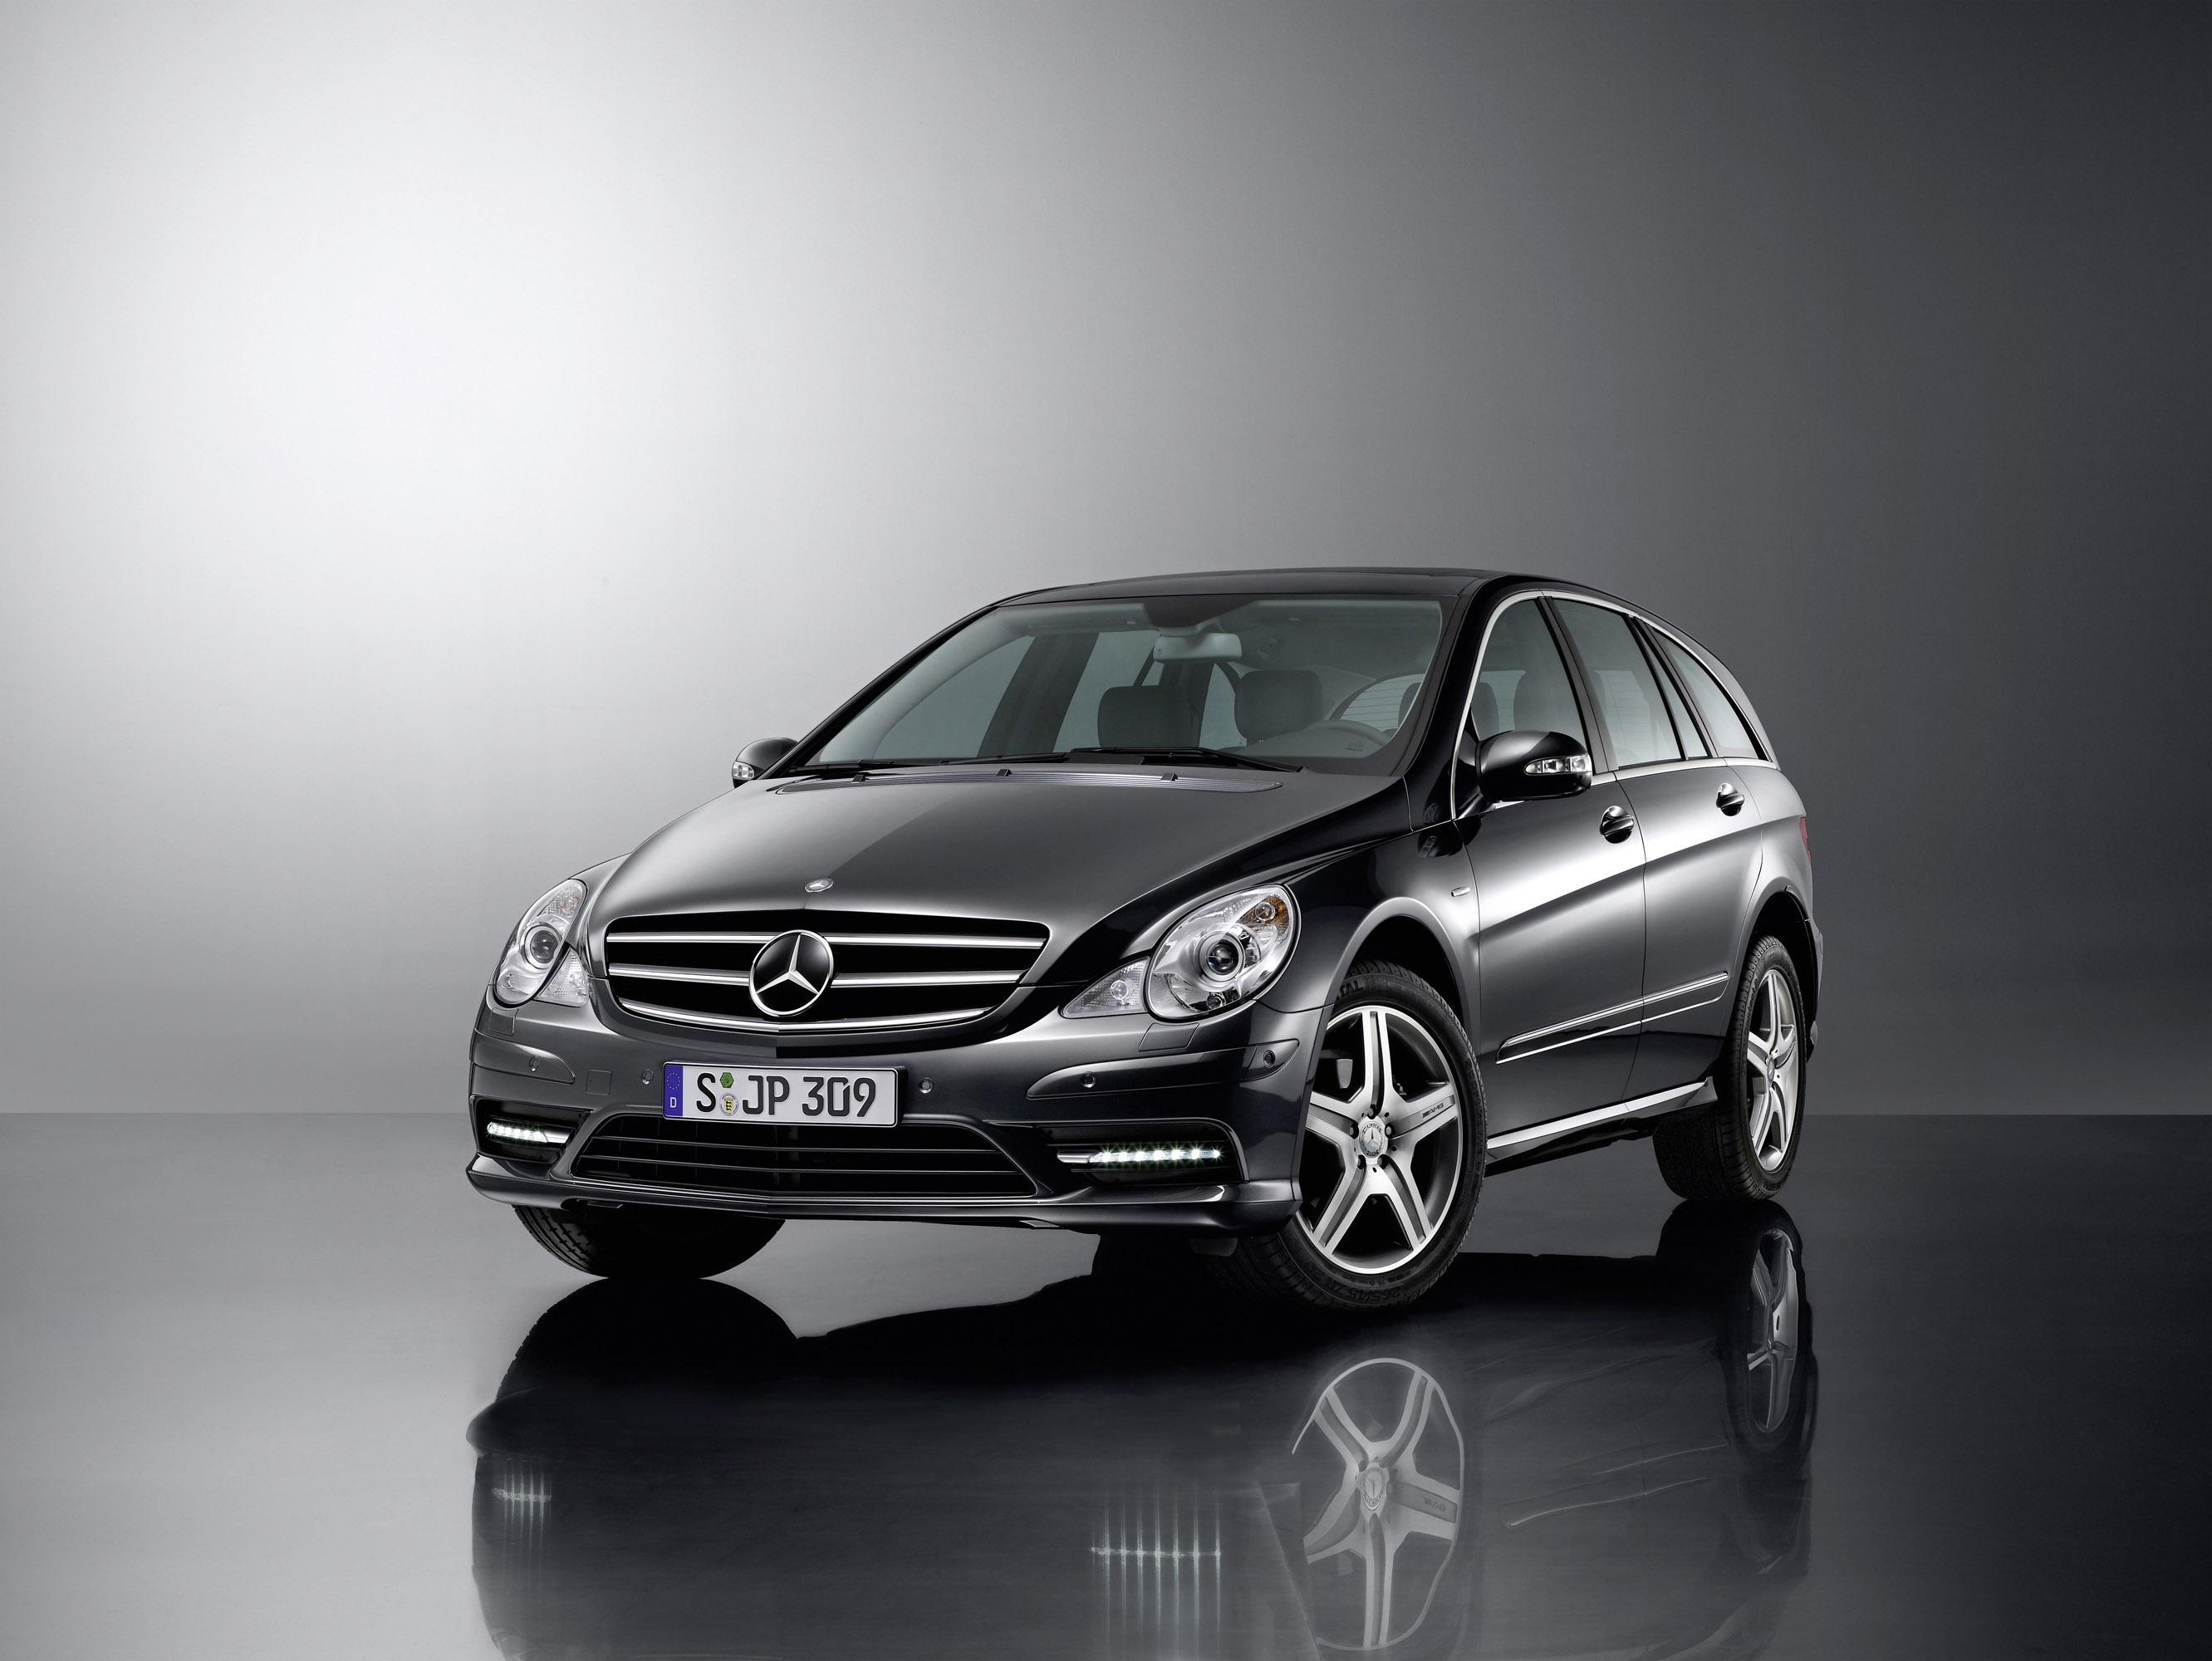 Mercedes Benz R-350 Grand Edition [эксклюзивные фотографии] - фотография №1